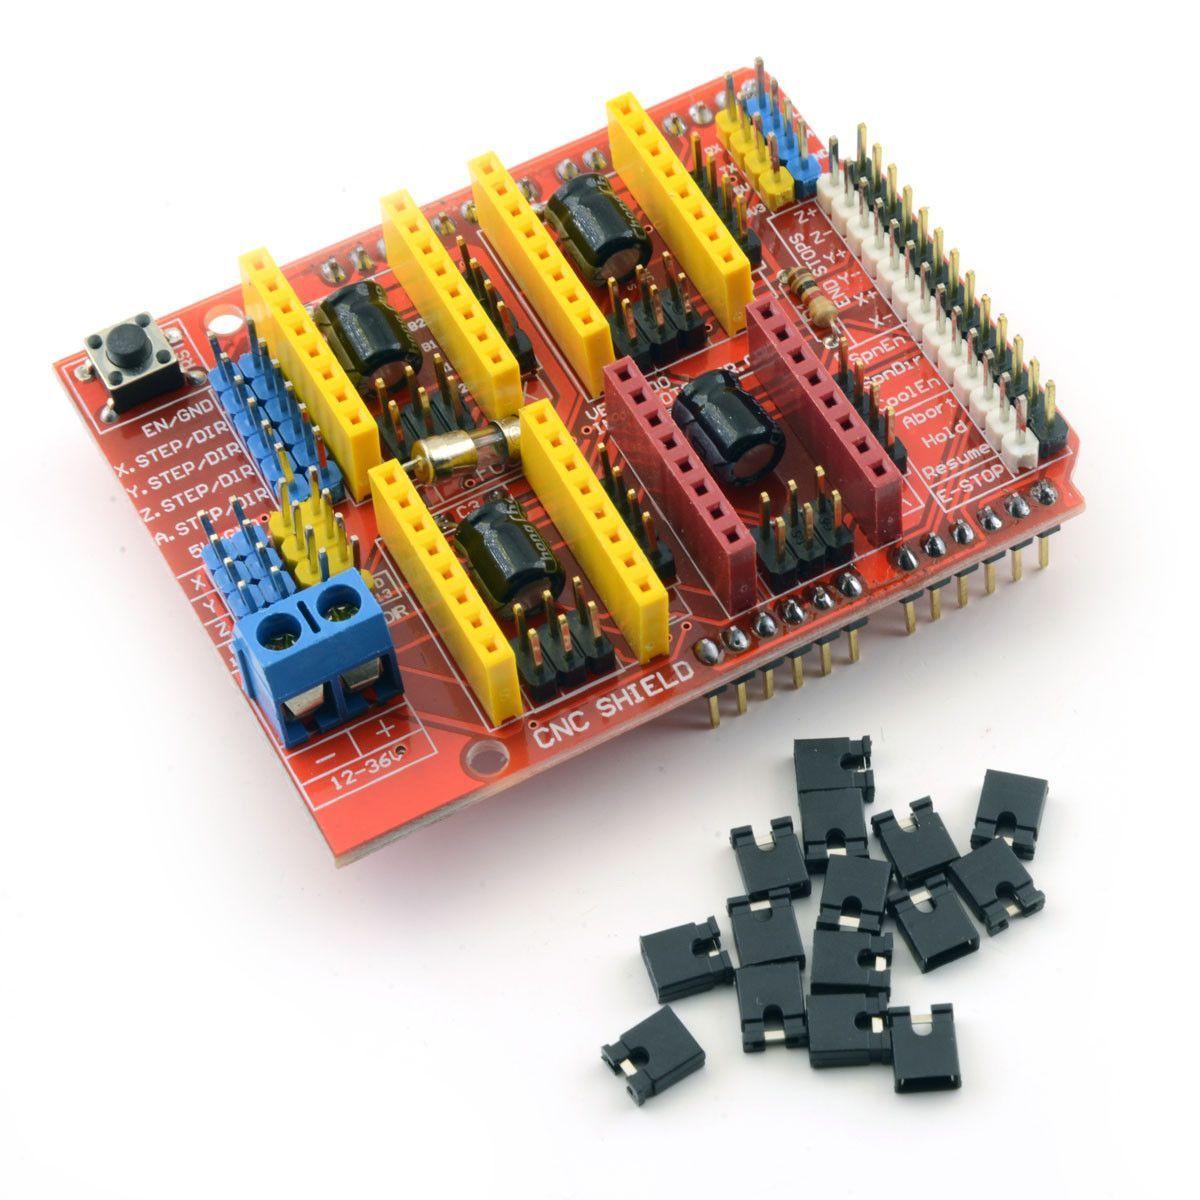 medium resolution of assembled cnc v3 arduino shield for a4988 drv8825 stepsticks router mill robot